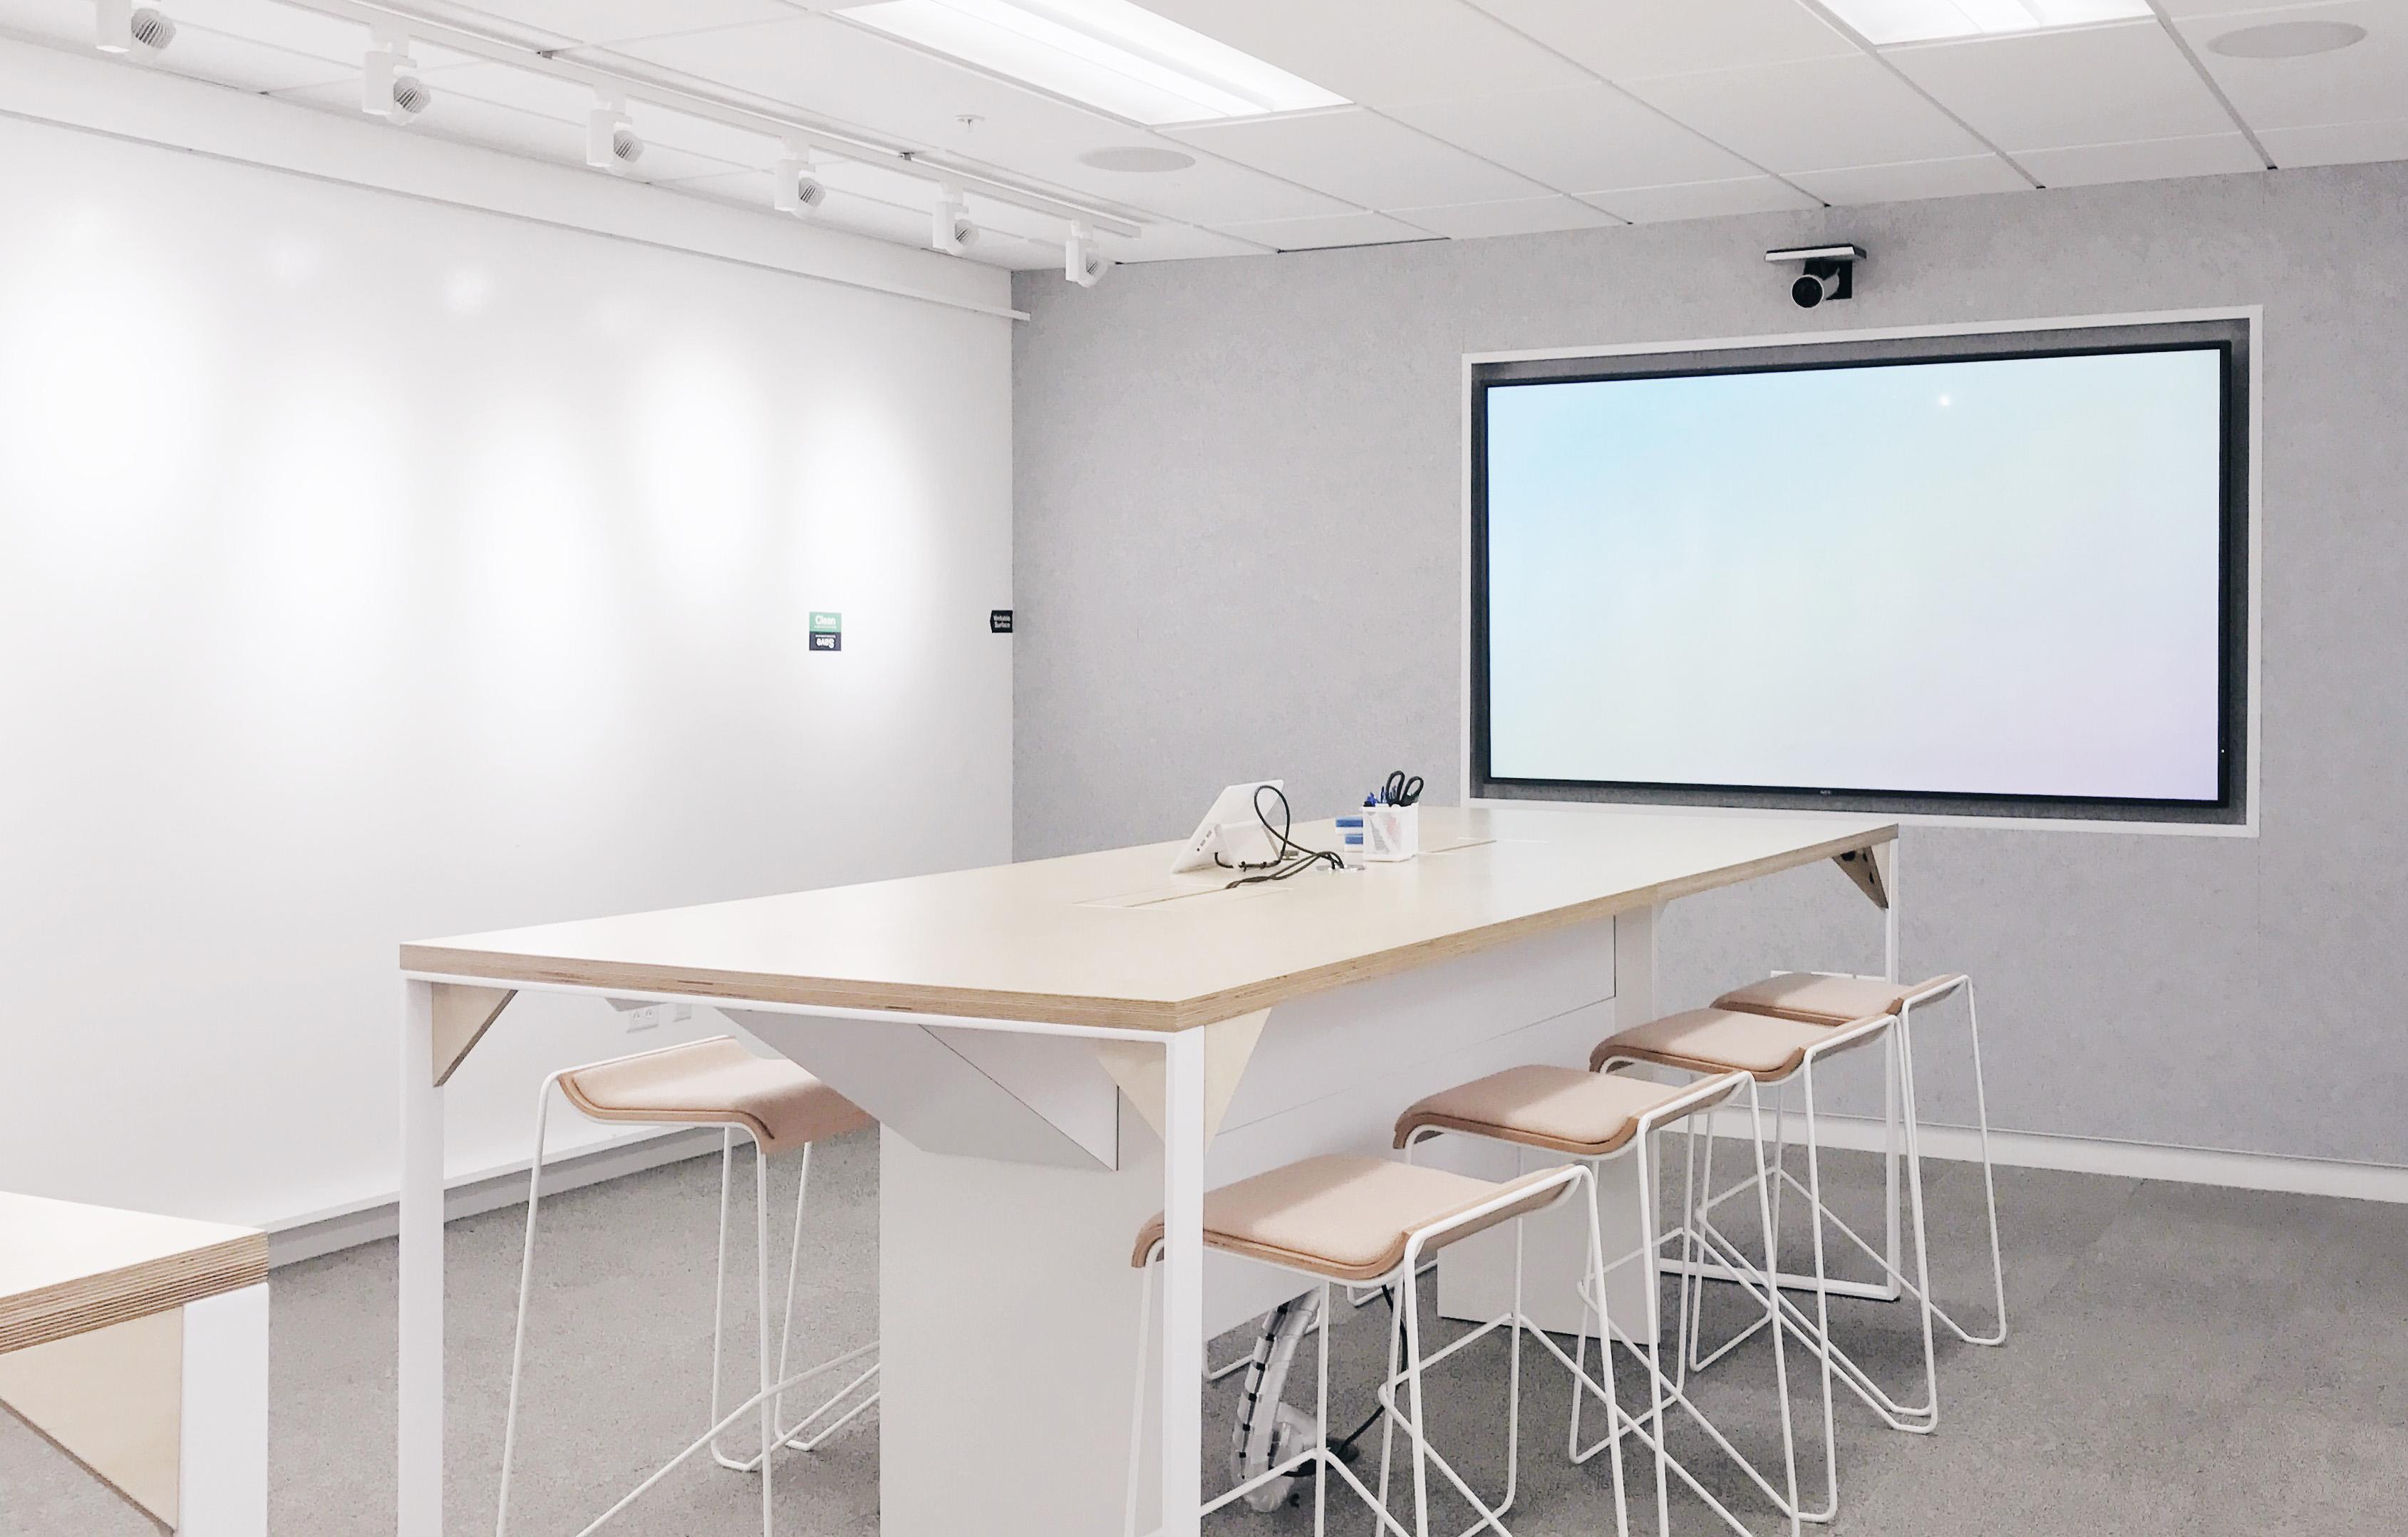 Design room in the New Instagram office.